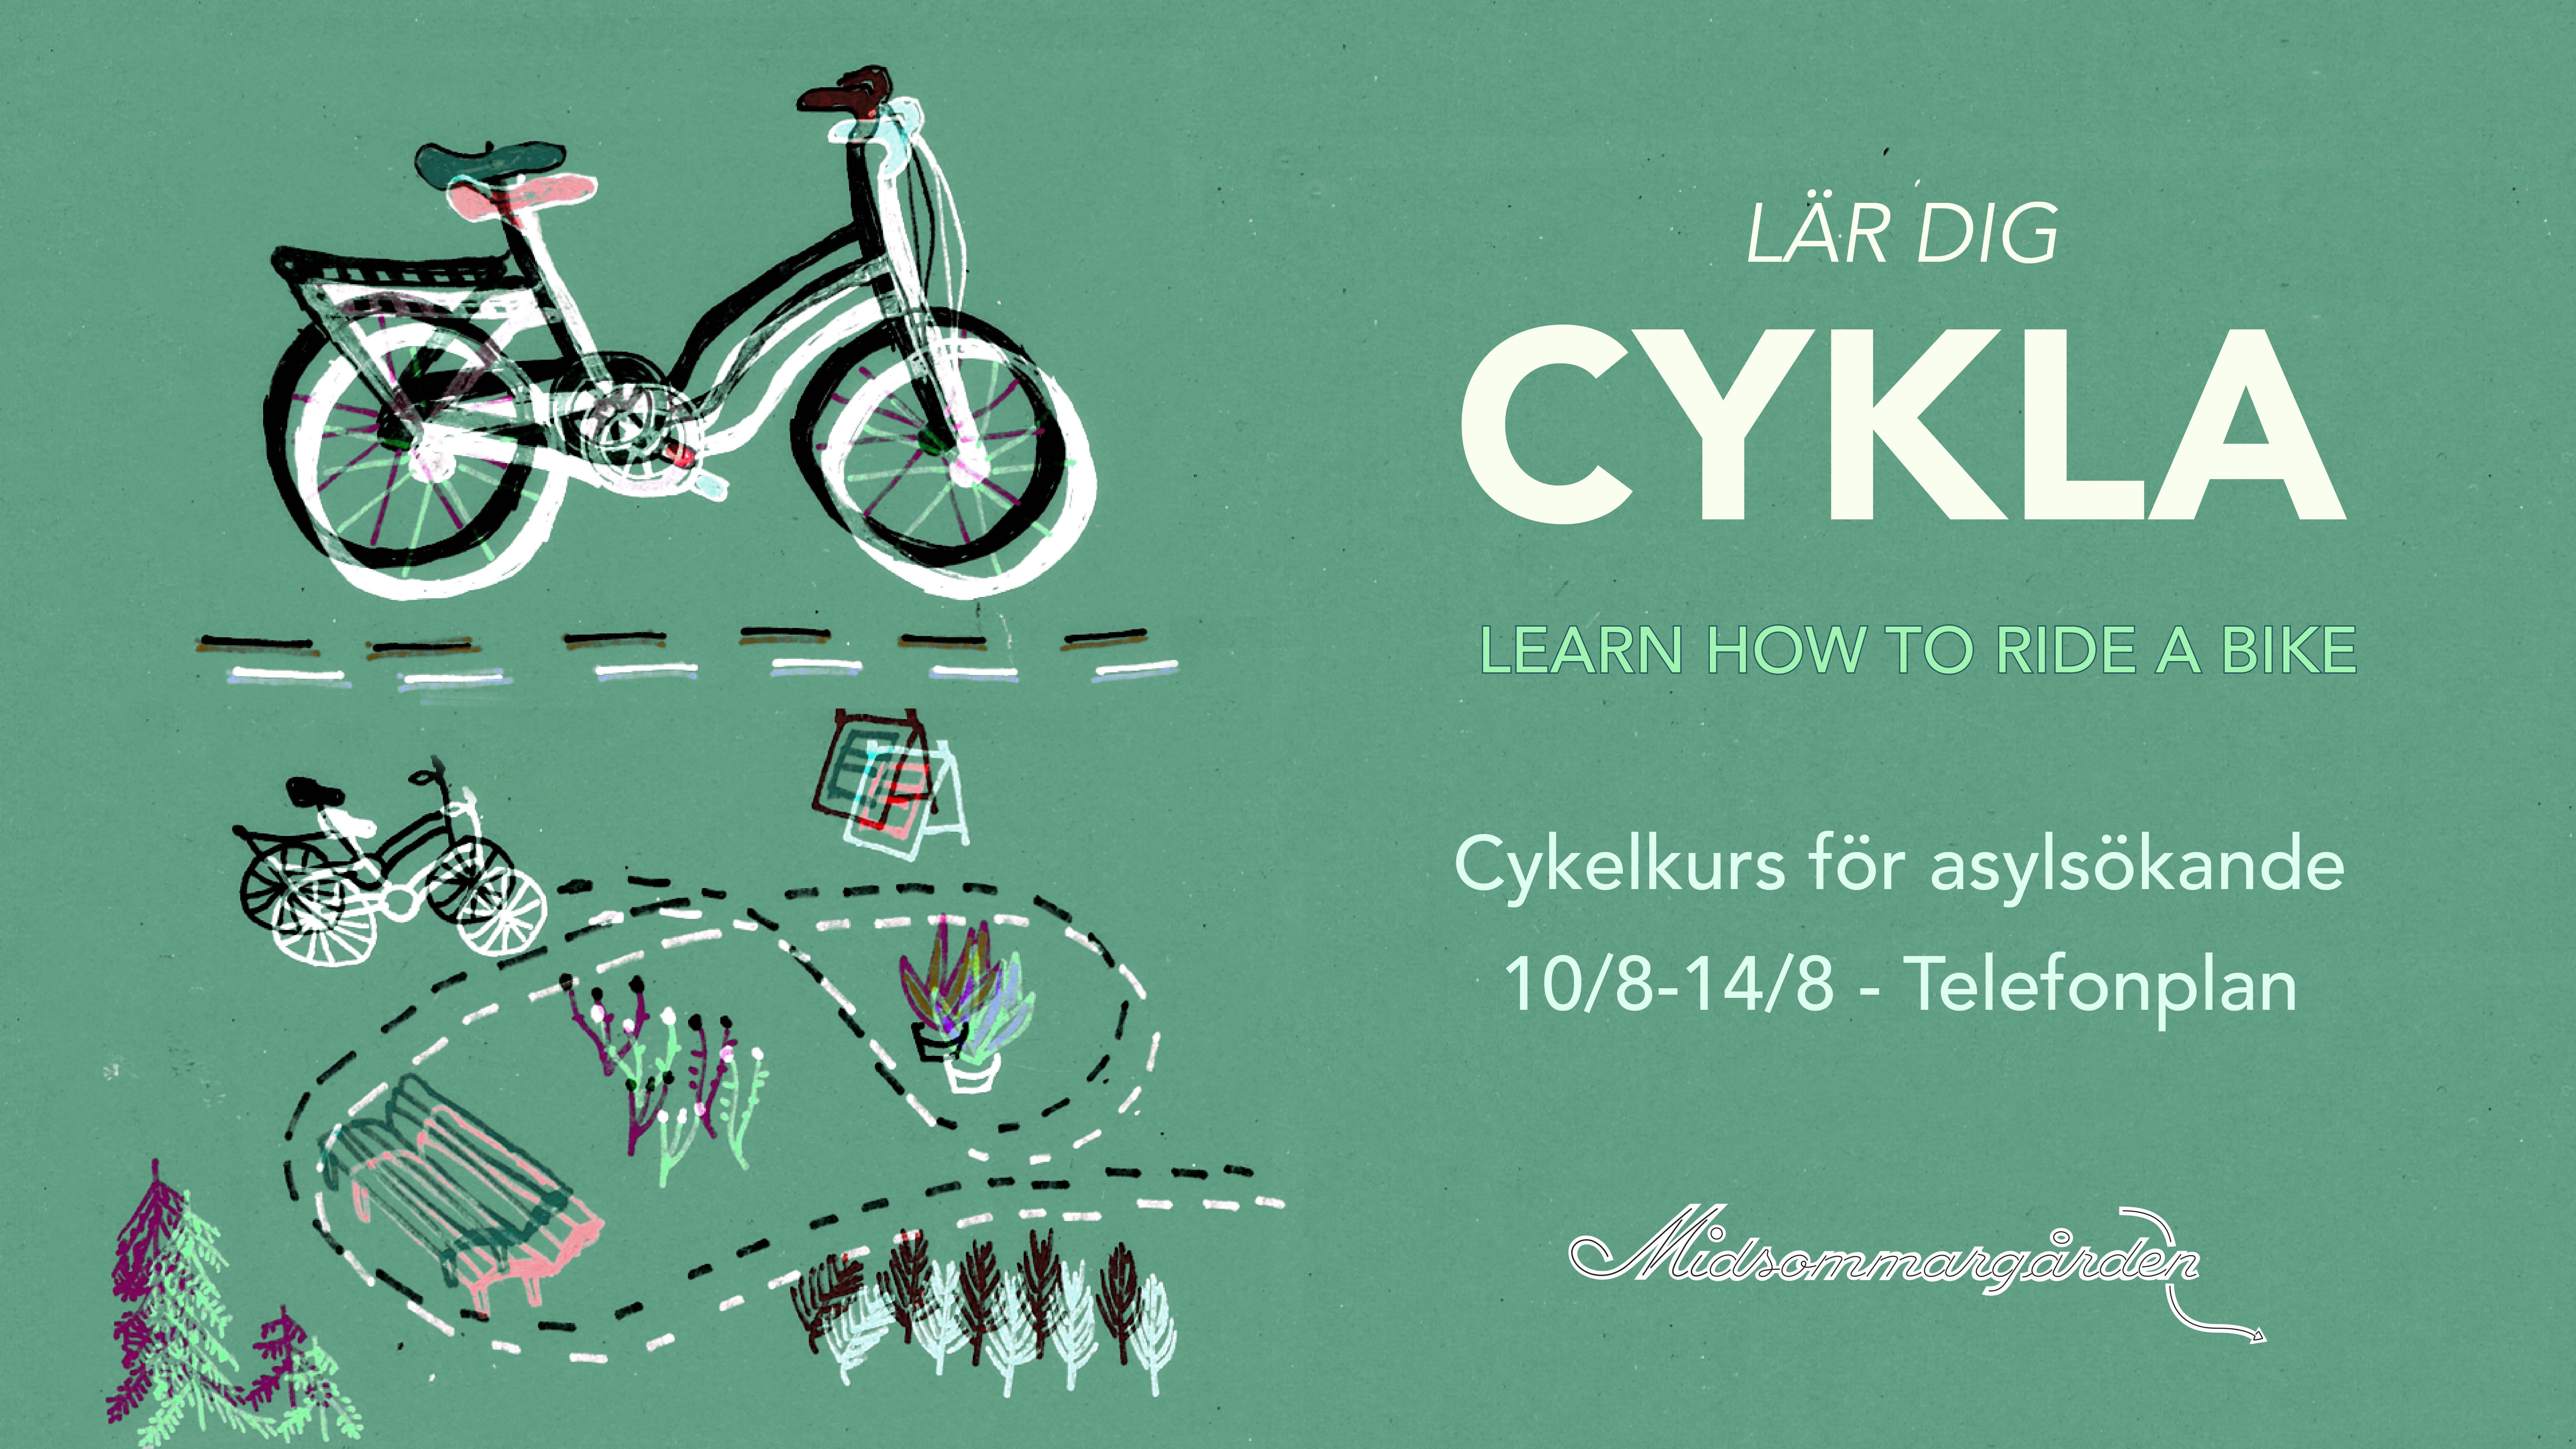 cykelkursbanneraugusti